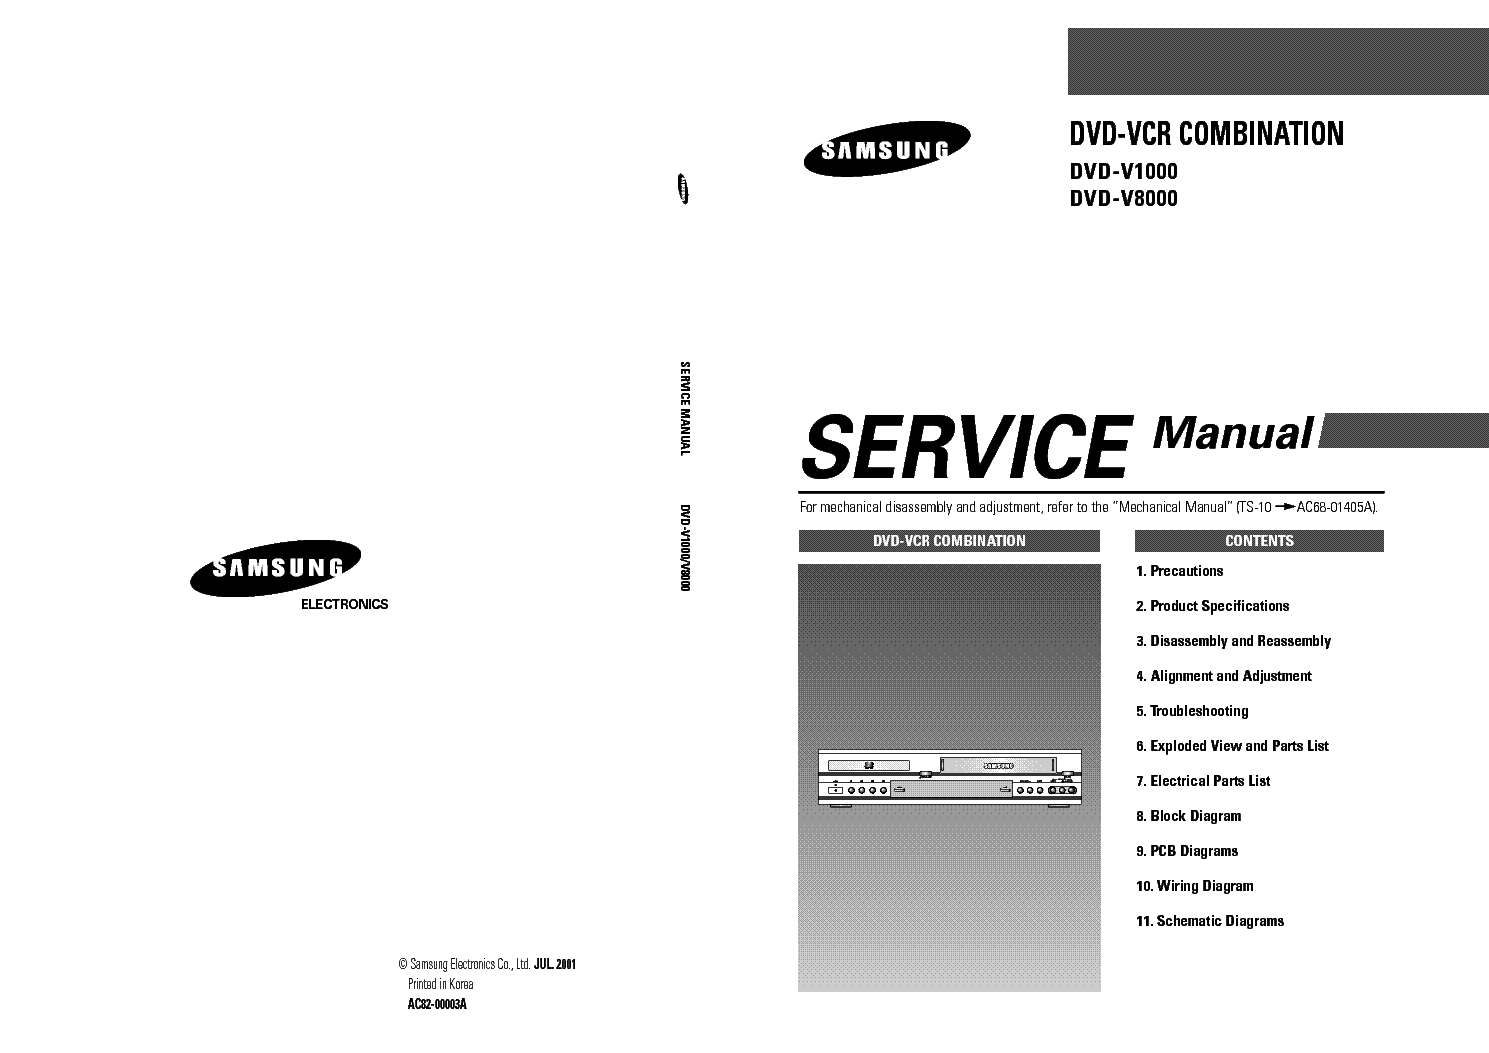 samsung dvd v1000 v8000 service manual download schematics eeprom rh elektrotanya com samsung dvd-hr725 service manual samsung dvd-r121 service manual